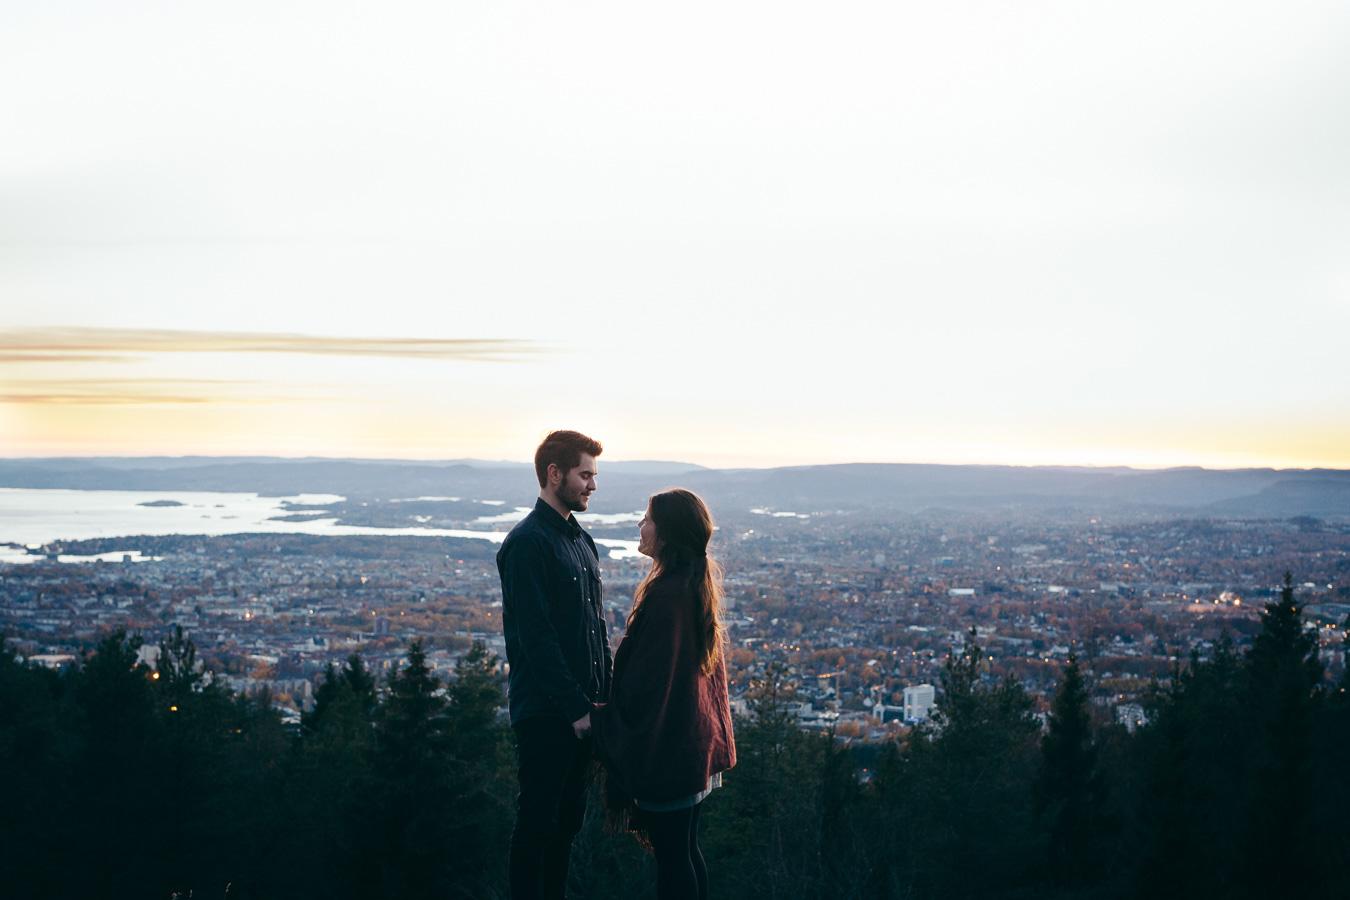 015-fotograf-forlovelse-grefesenkollen.jpg